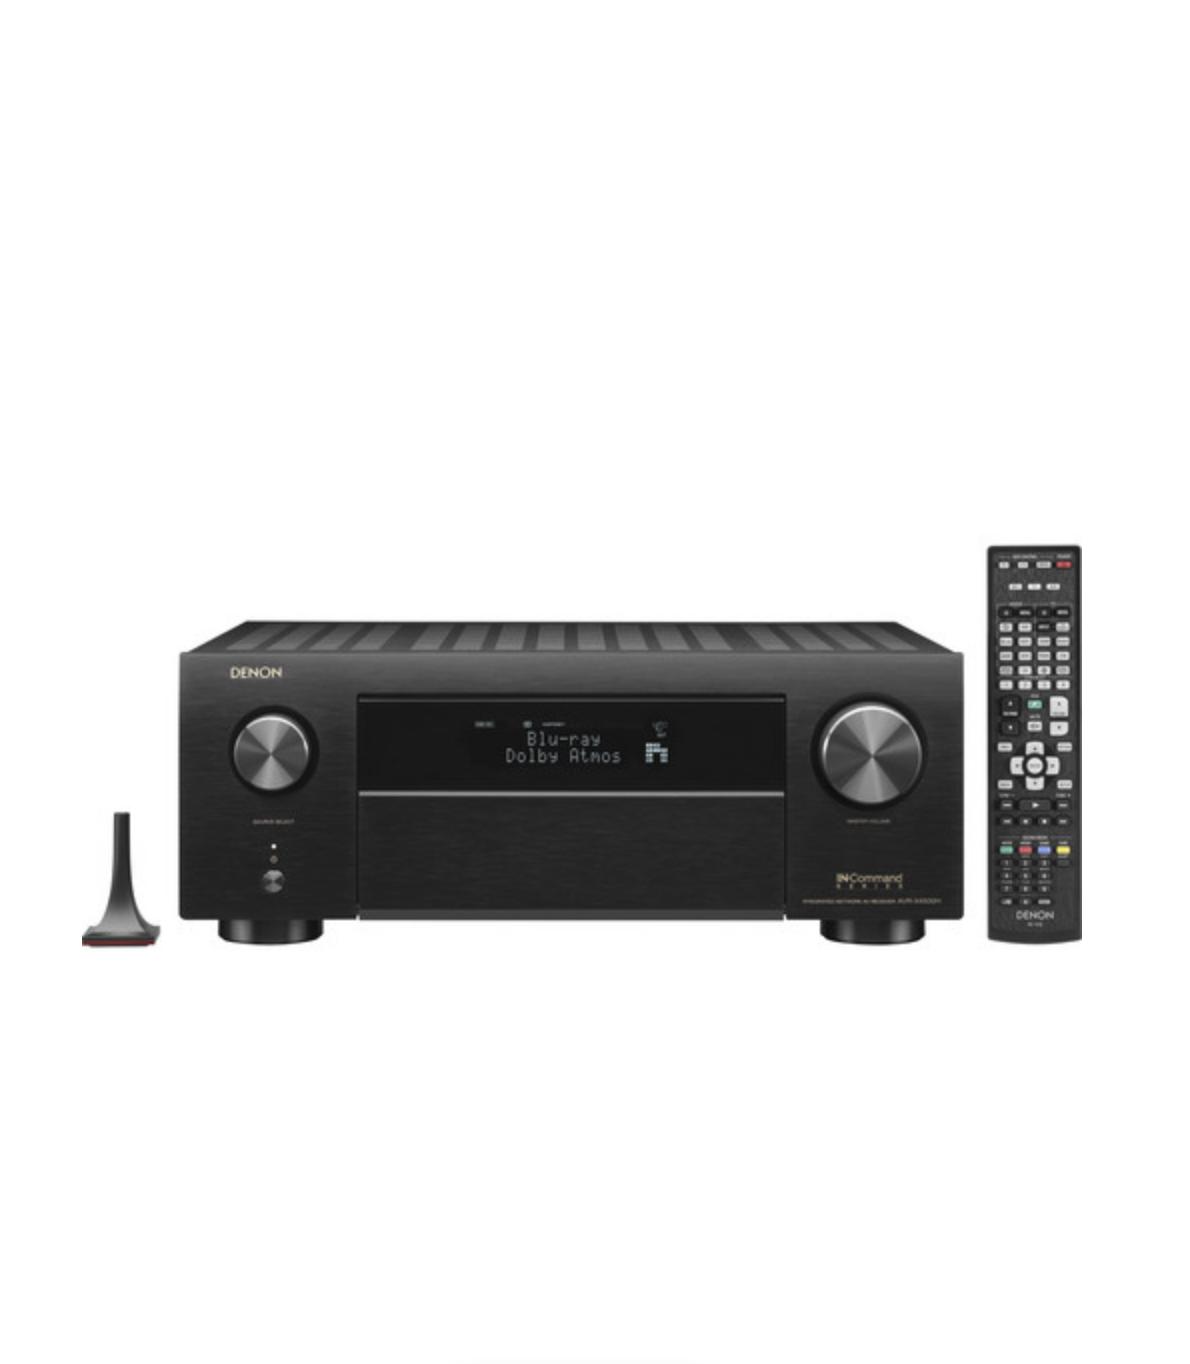 Receiver Denon AVR-X4500H 9.2ch WiFi Bluetooth 4K UHD 3D HDR10 Dolby Atmos DTX:X - Preto/220v